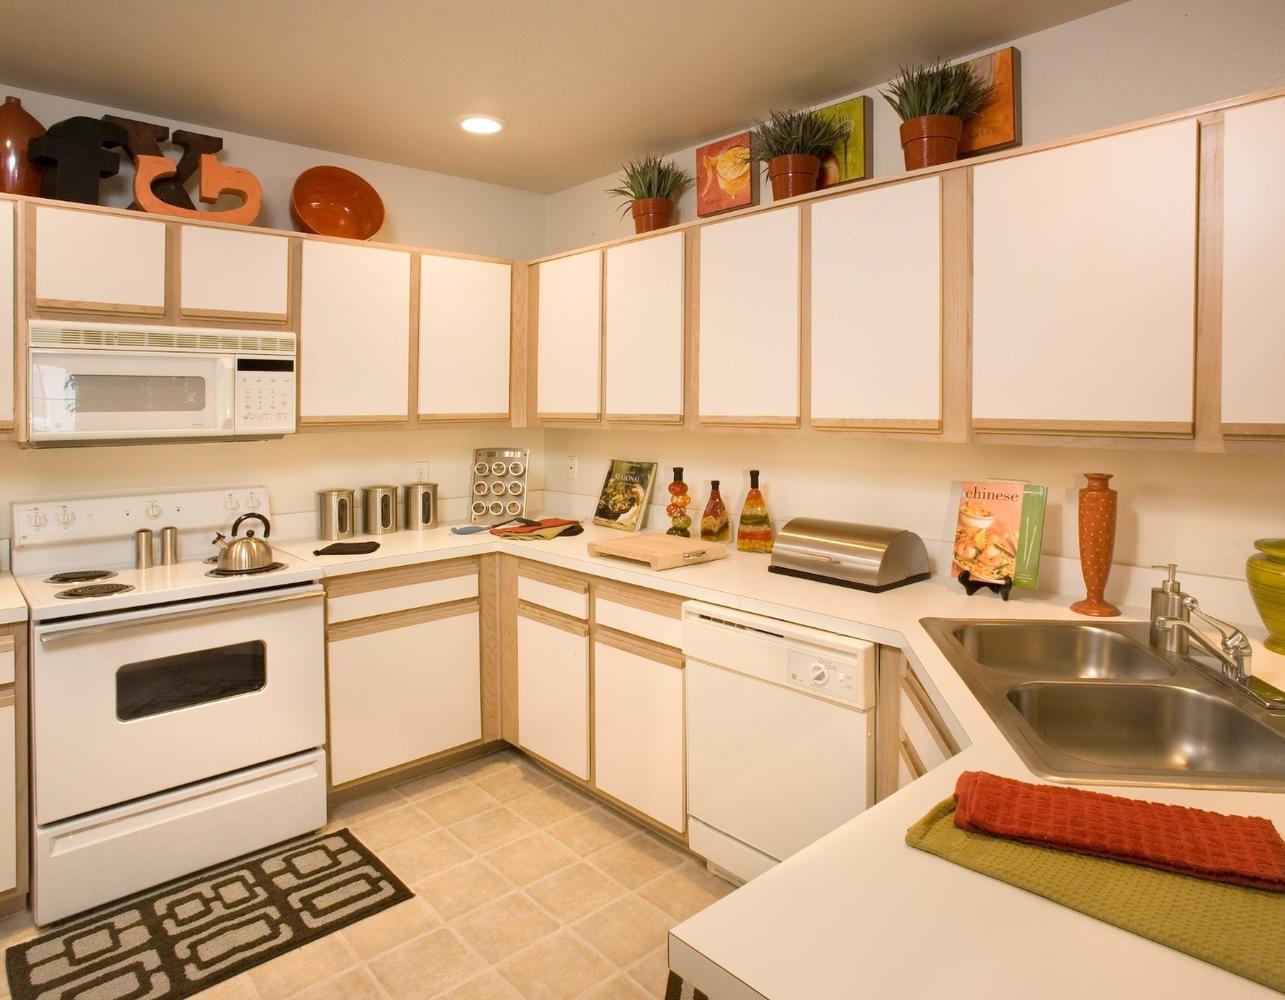 Gables Turtle Creek Cityplace | Gables Residential Communities